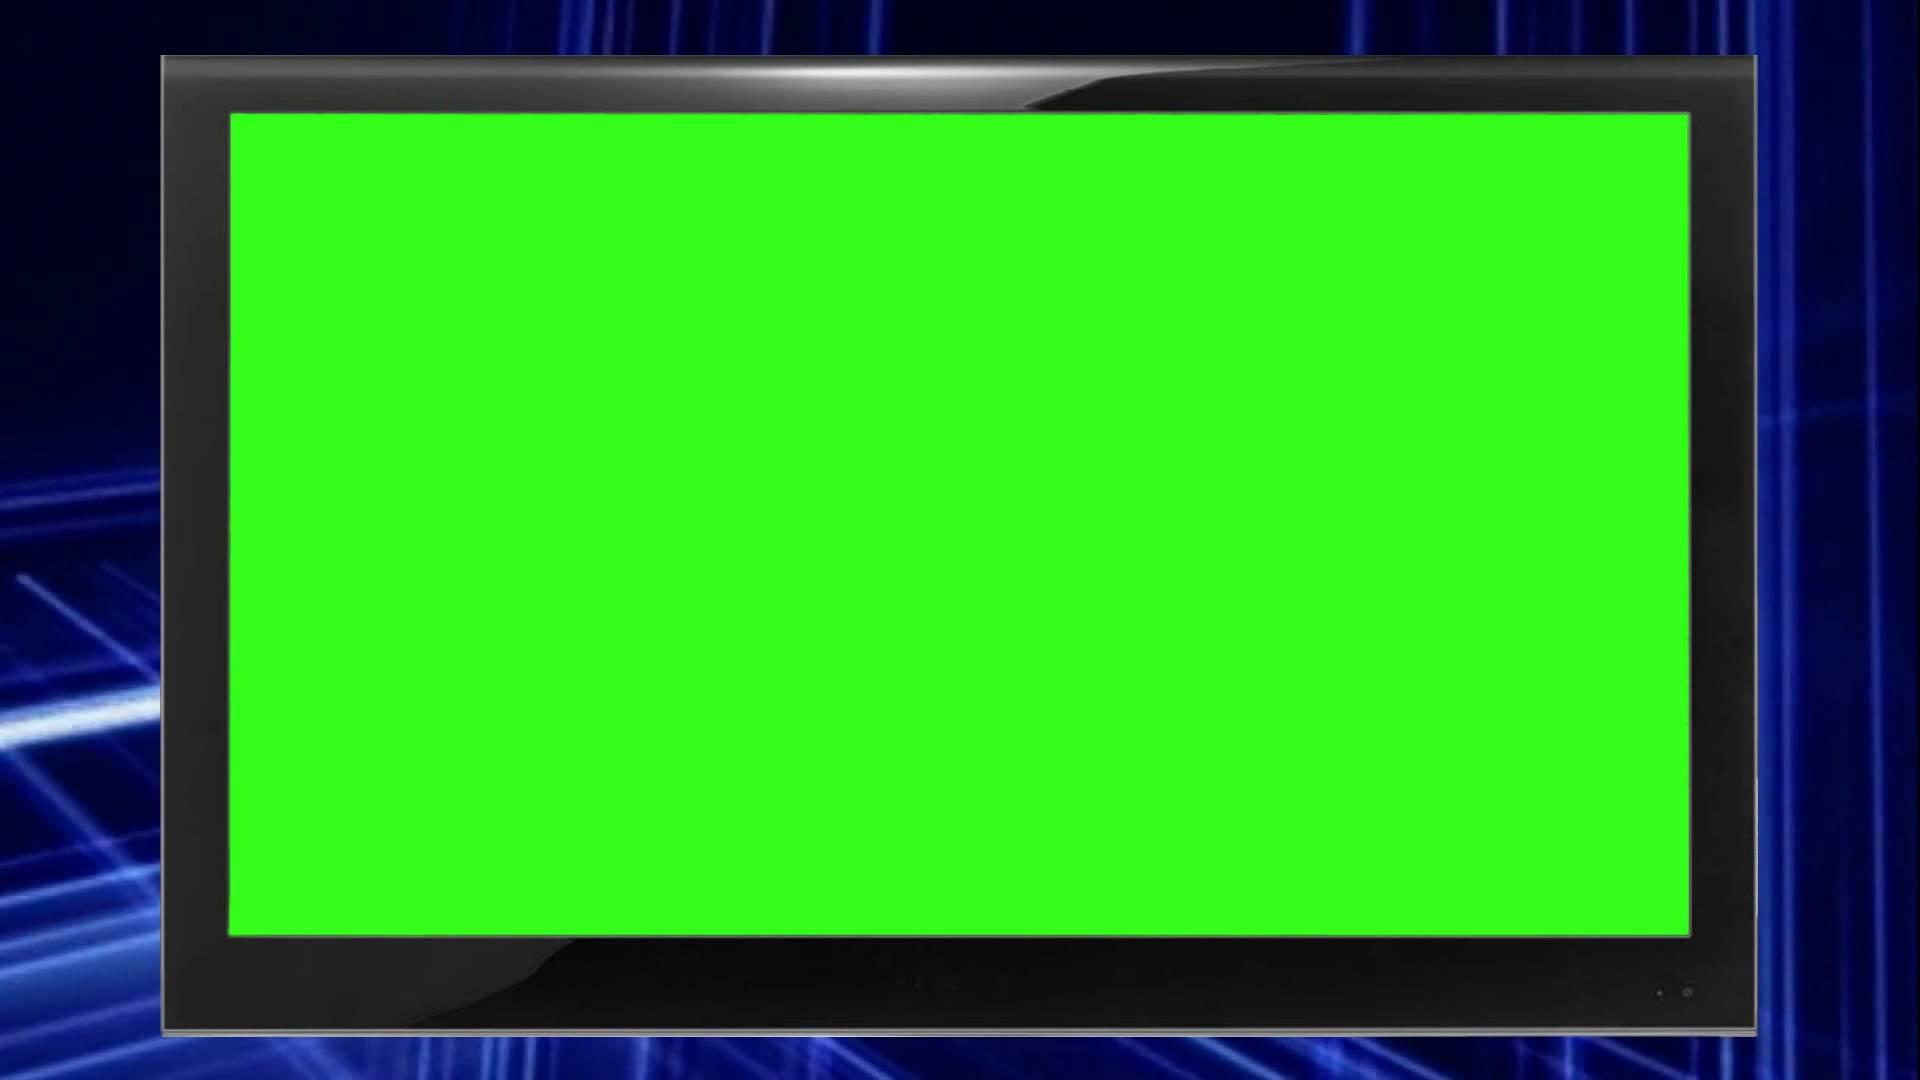 Green screen clipart video clipart royalty free stock HD Green Screen Backgrounds - Wallpaper Cave clipart royalty free stock